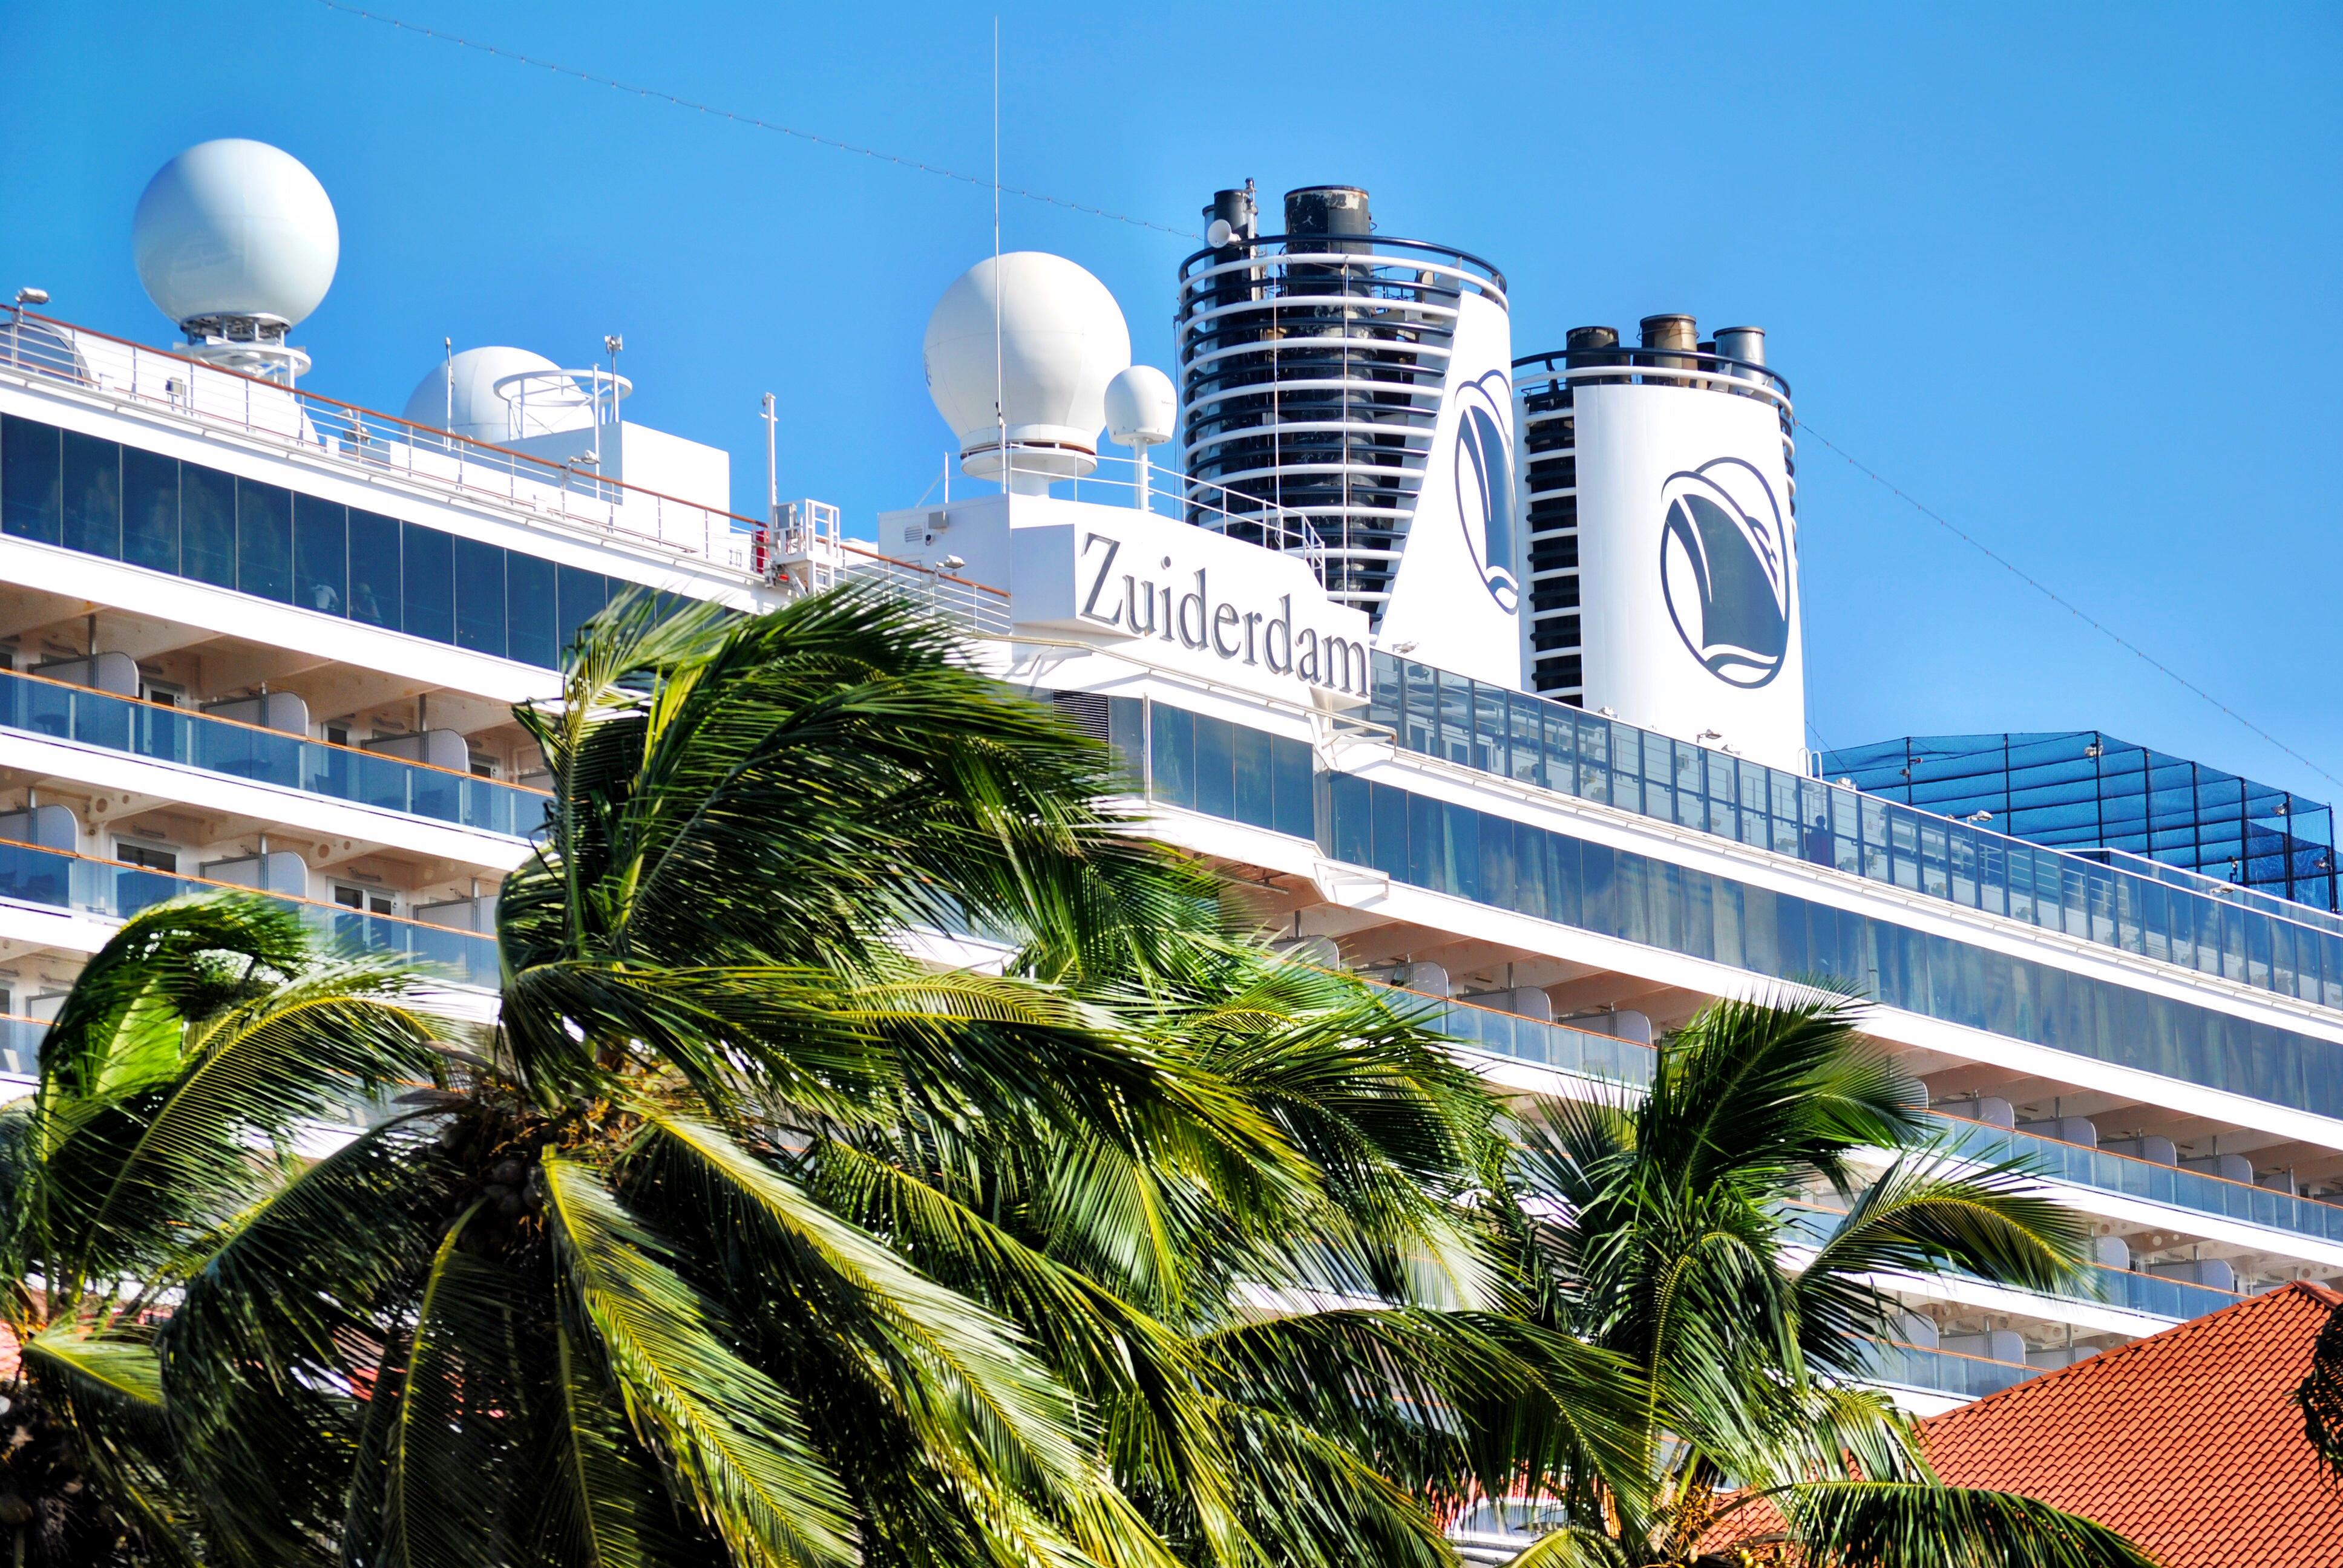 Holland America's Zuiderdam Panama Canal Cruise